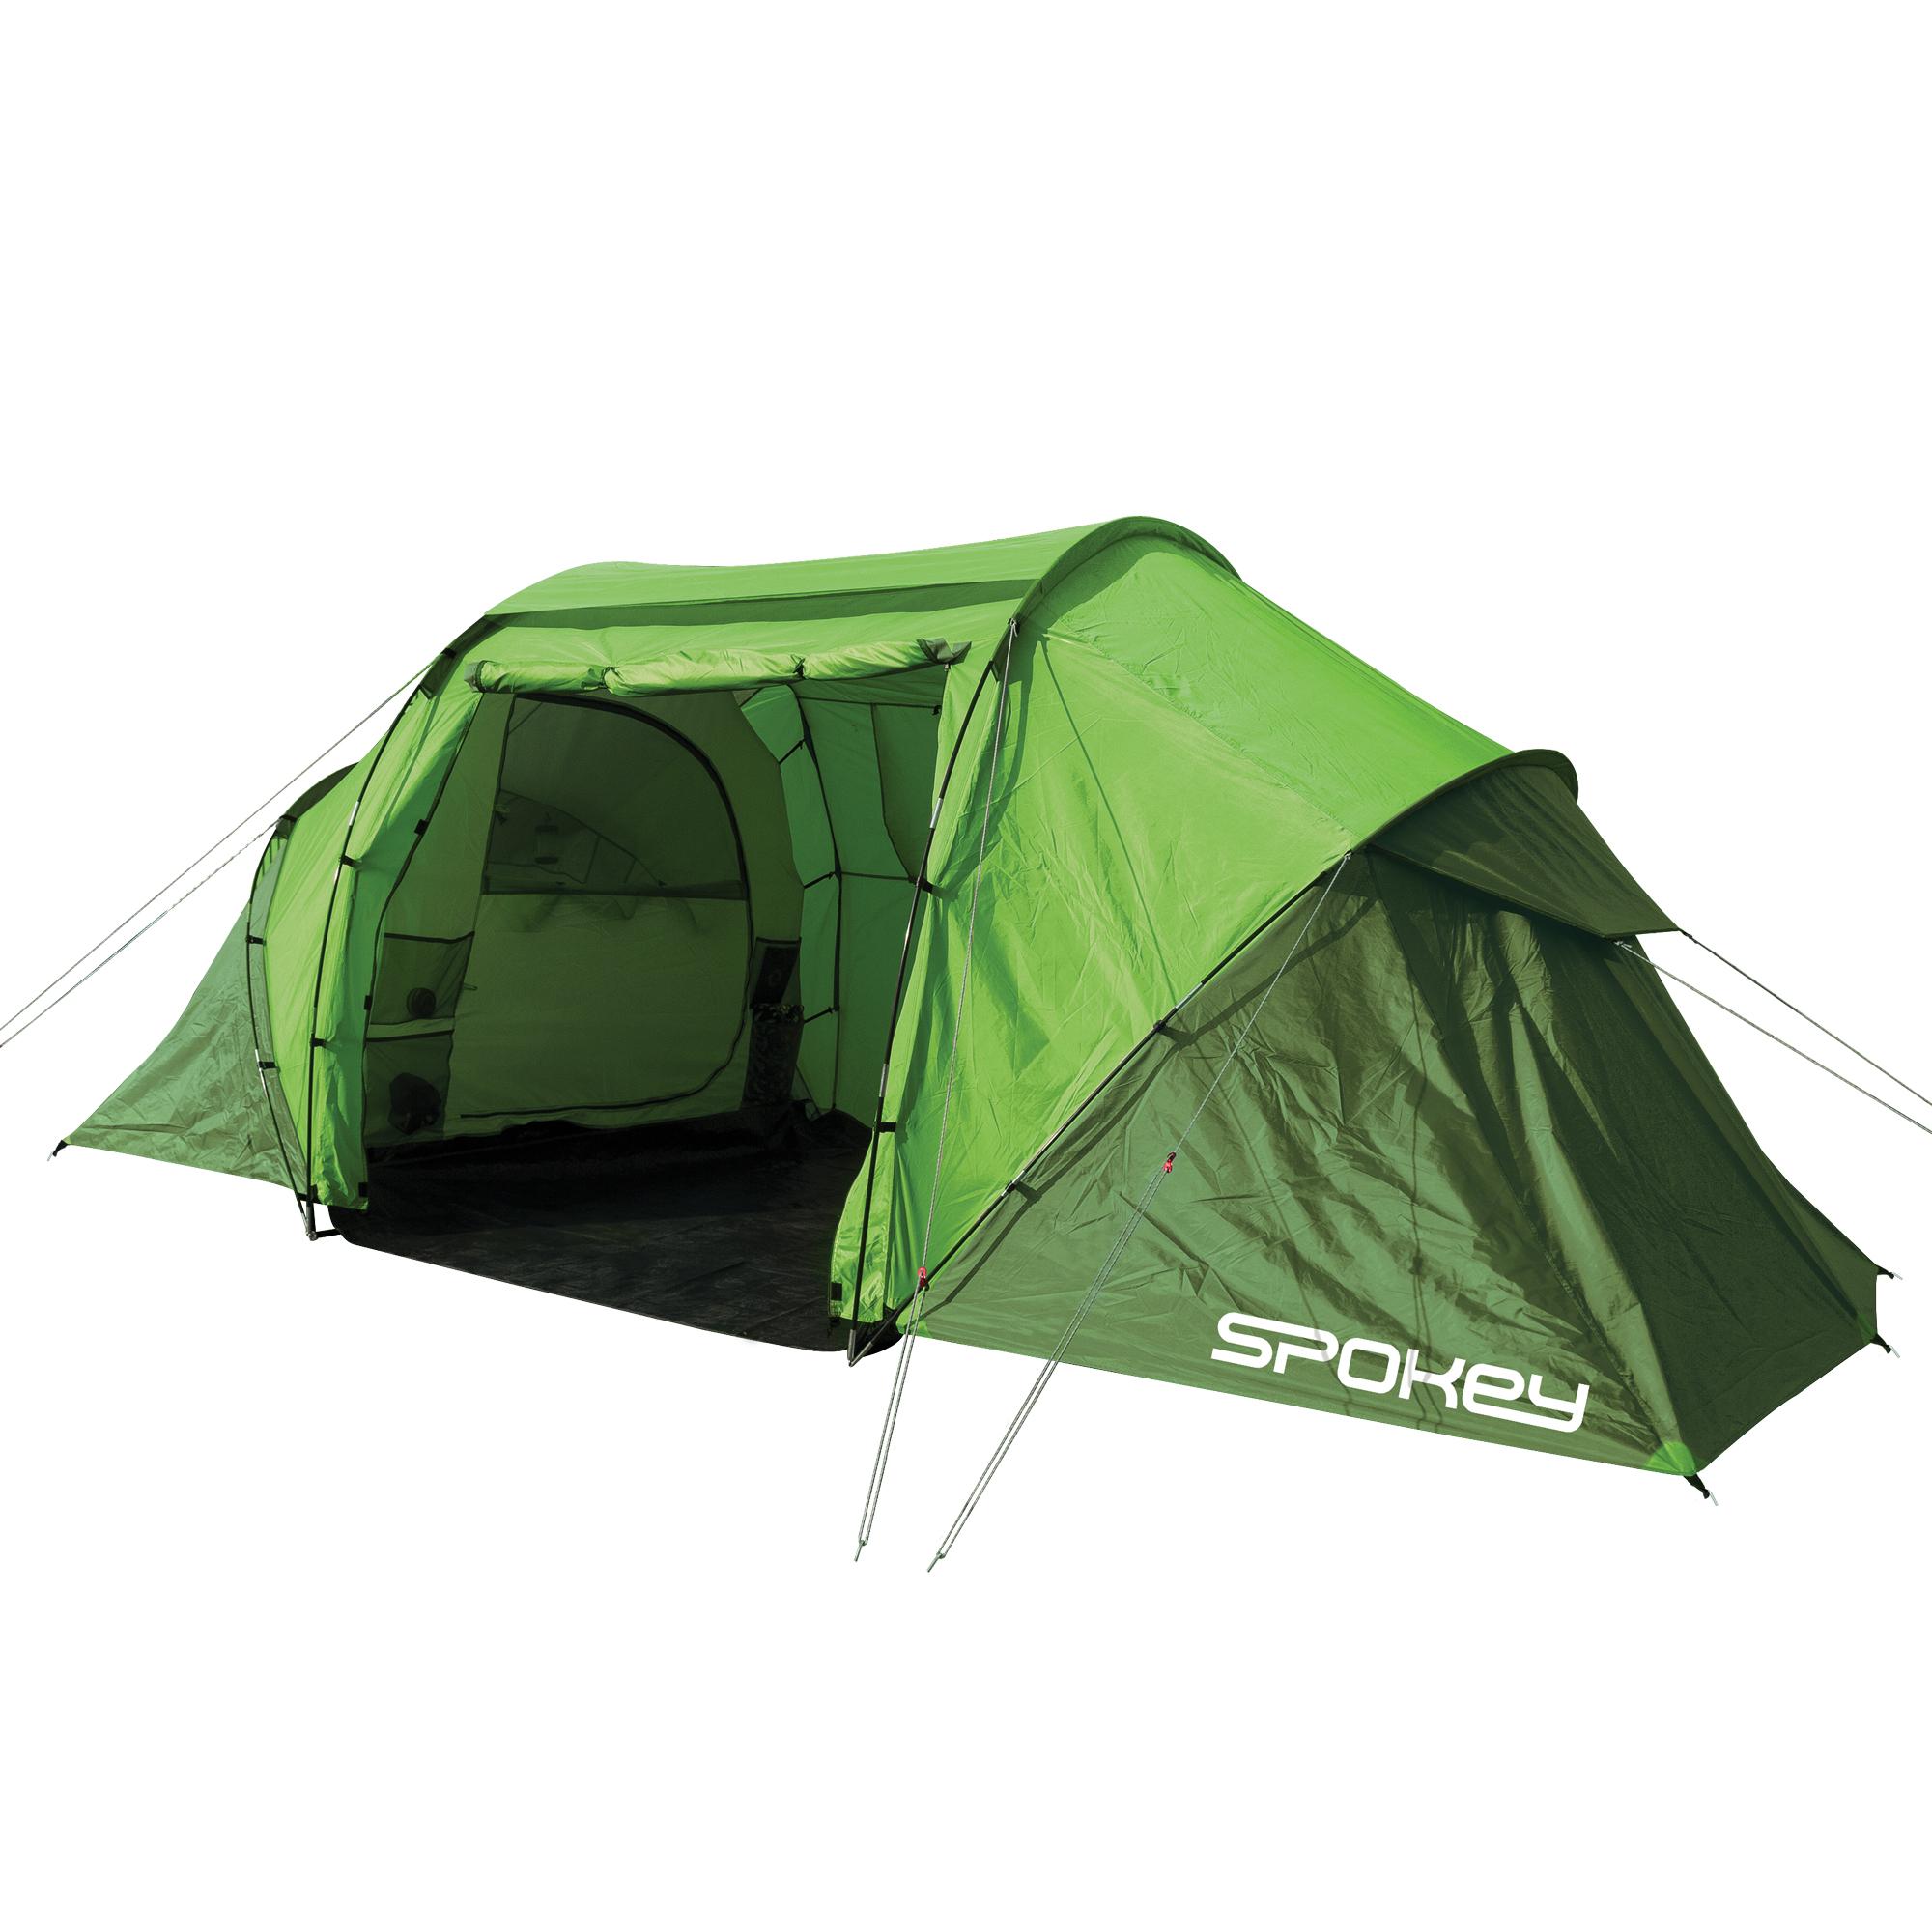 Ogromny Namiot campingowy TIMBERLANE 2+2 - Spokey HX57